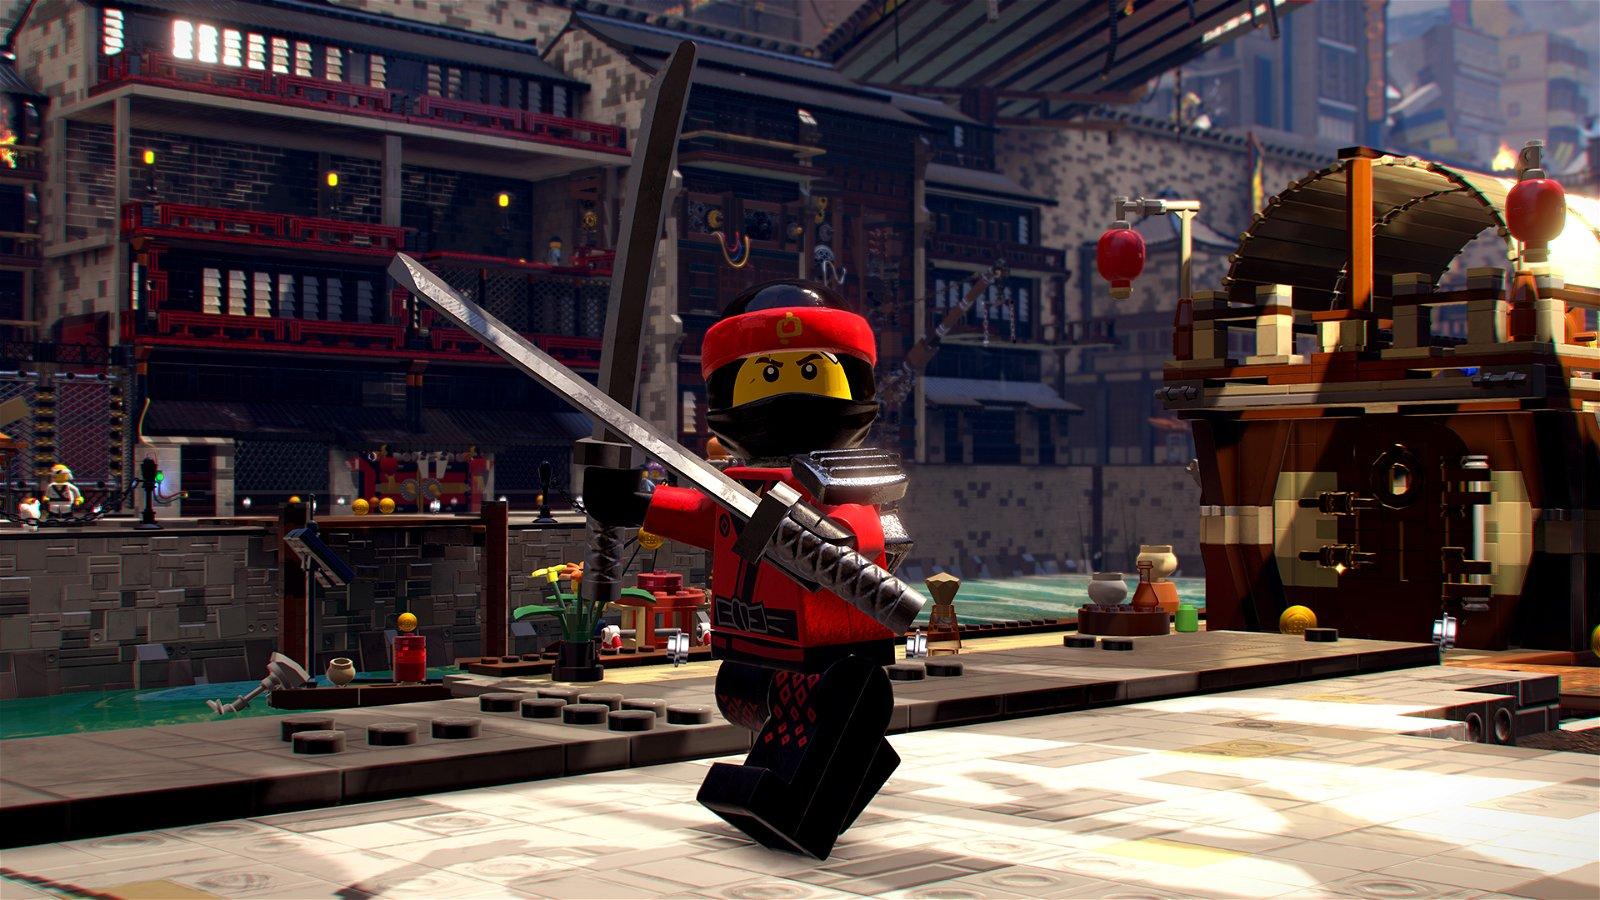 The lego ninjago movie video game review lacking a ninja - Lego ninjago 4 ...